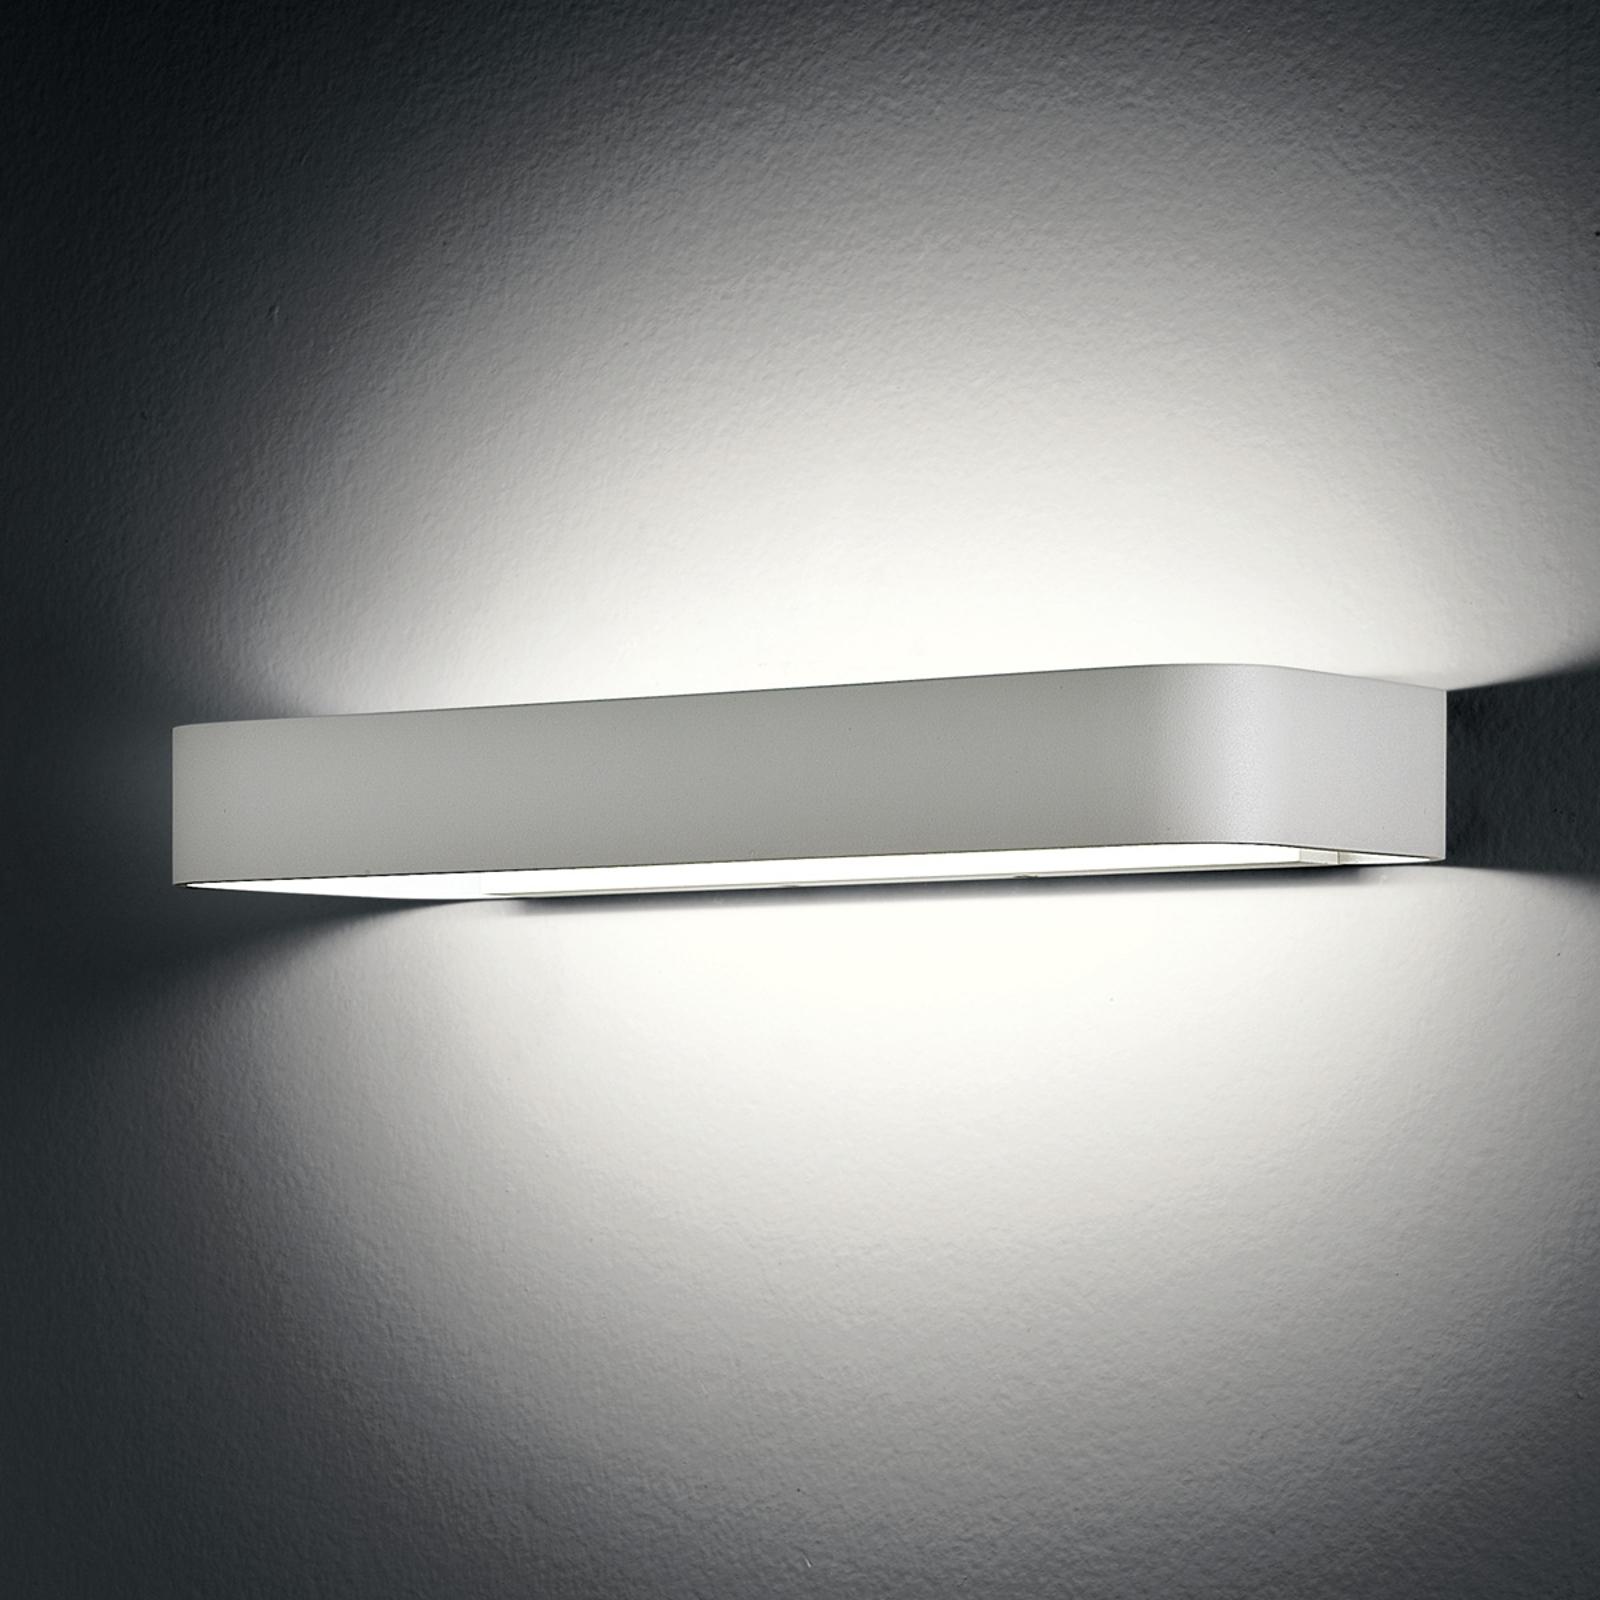 LED-Wandleuchte Henry, 8,1 W inkl. Treiber